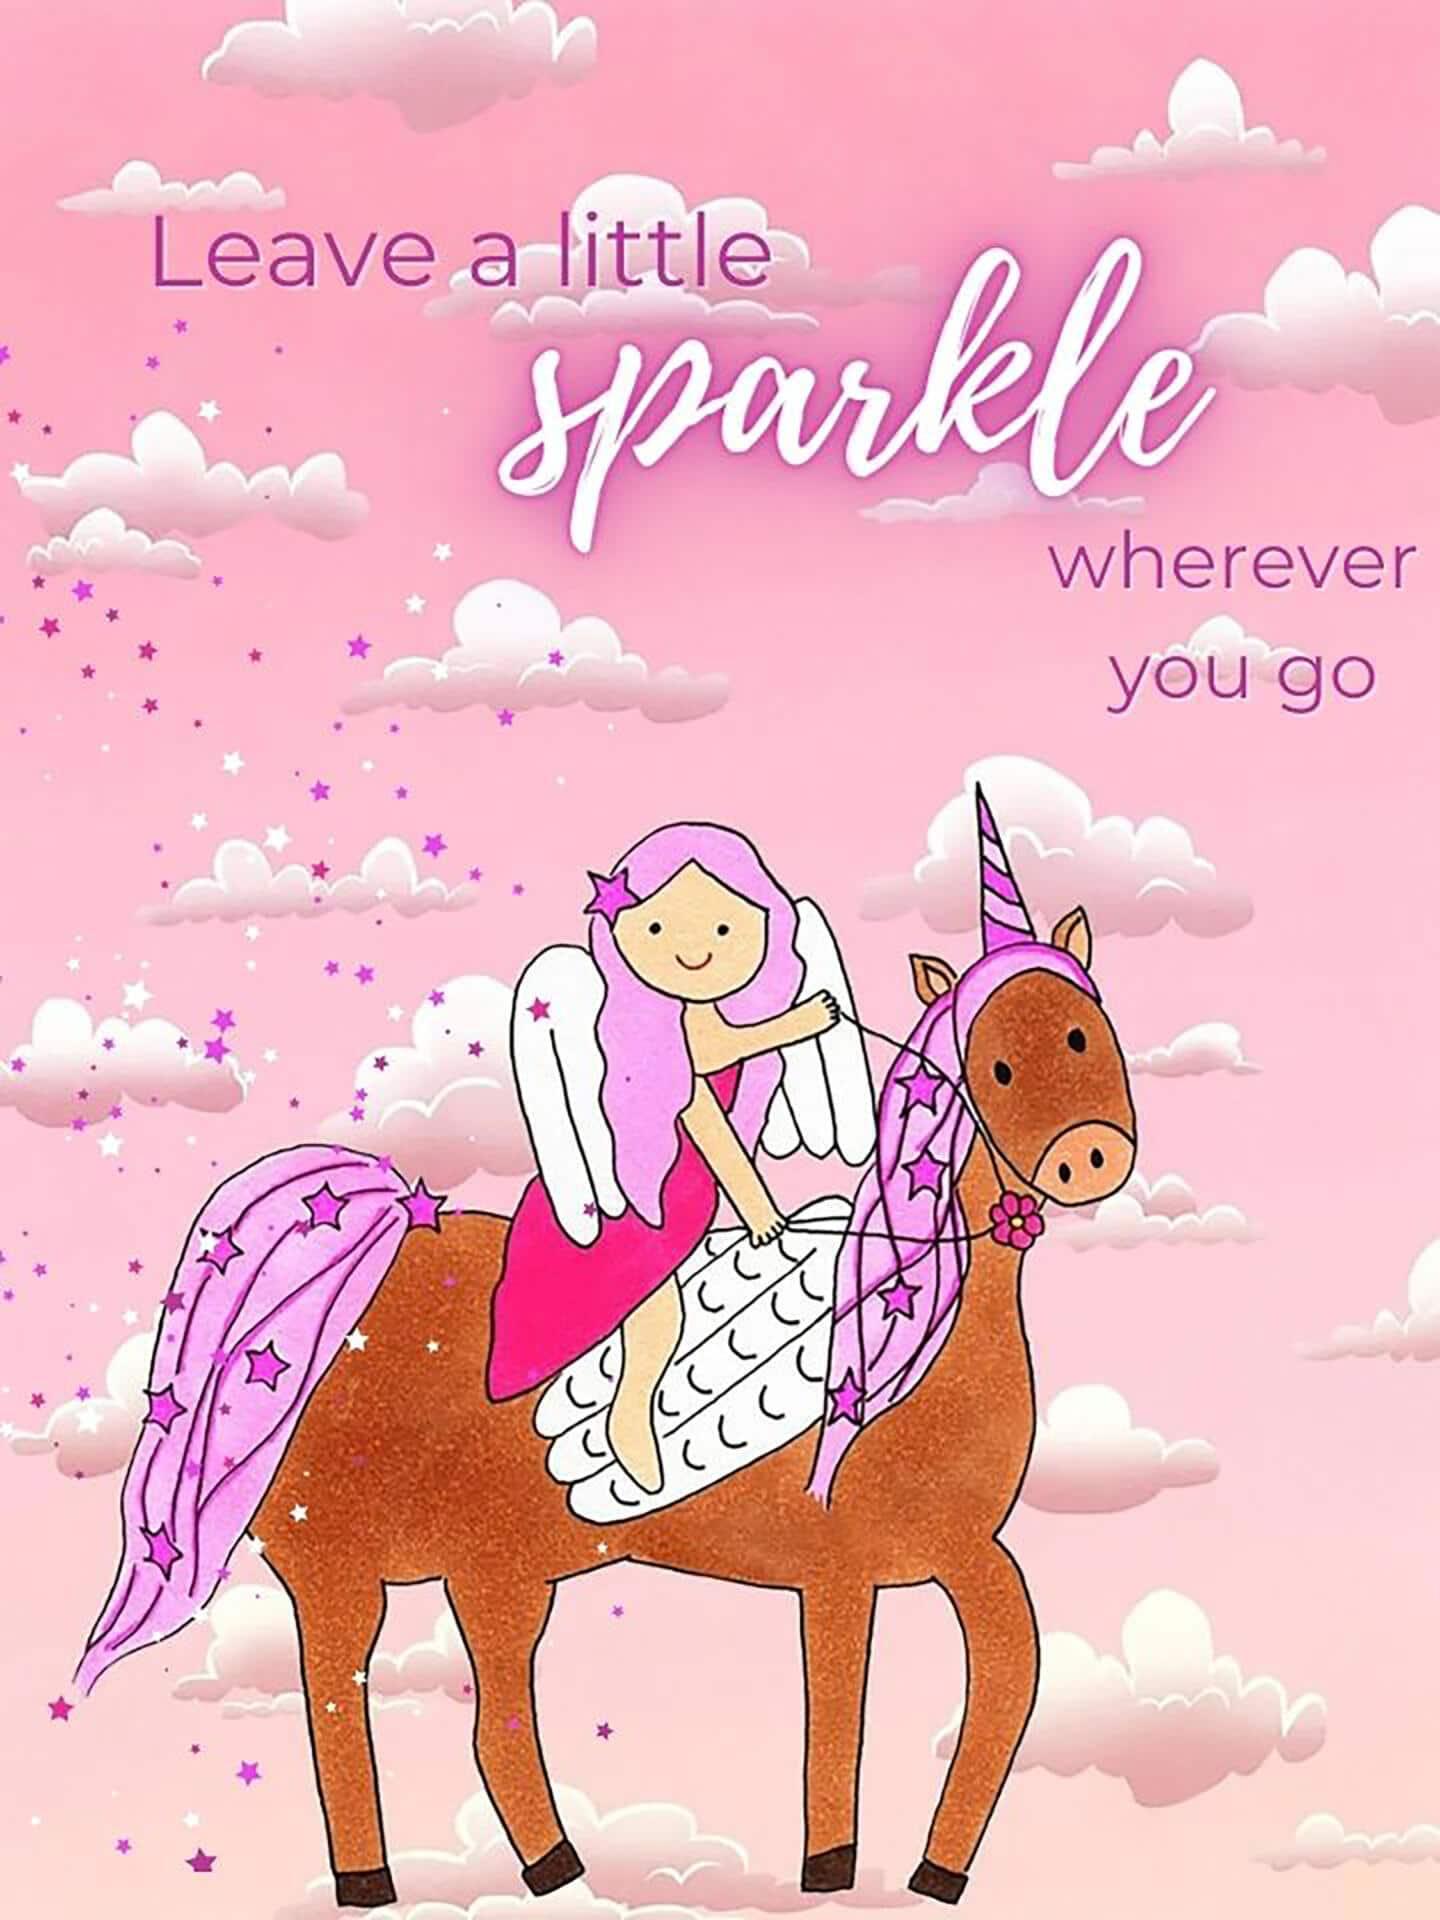 Princess & Unicorn Sparkles Card